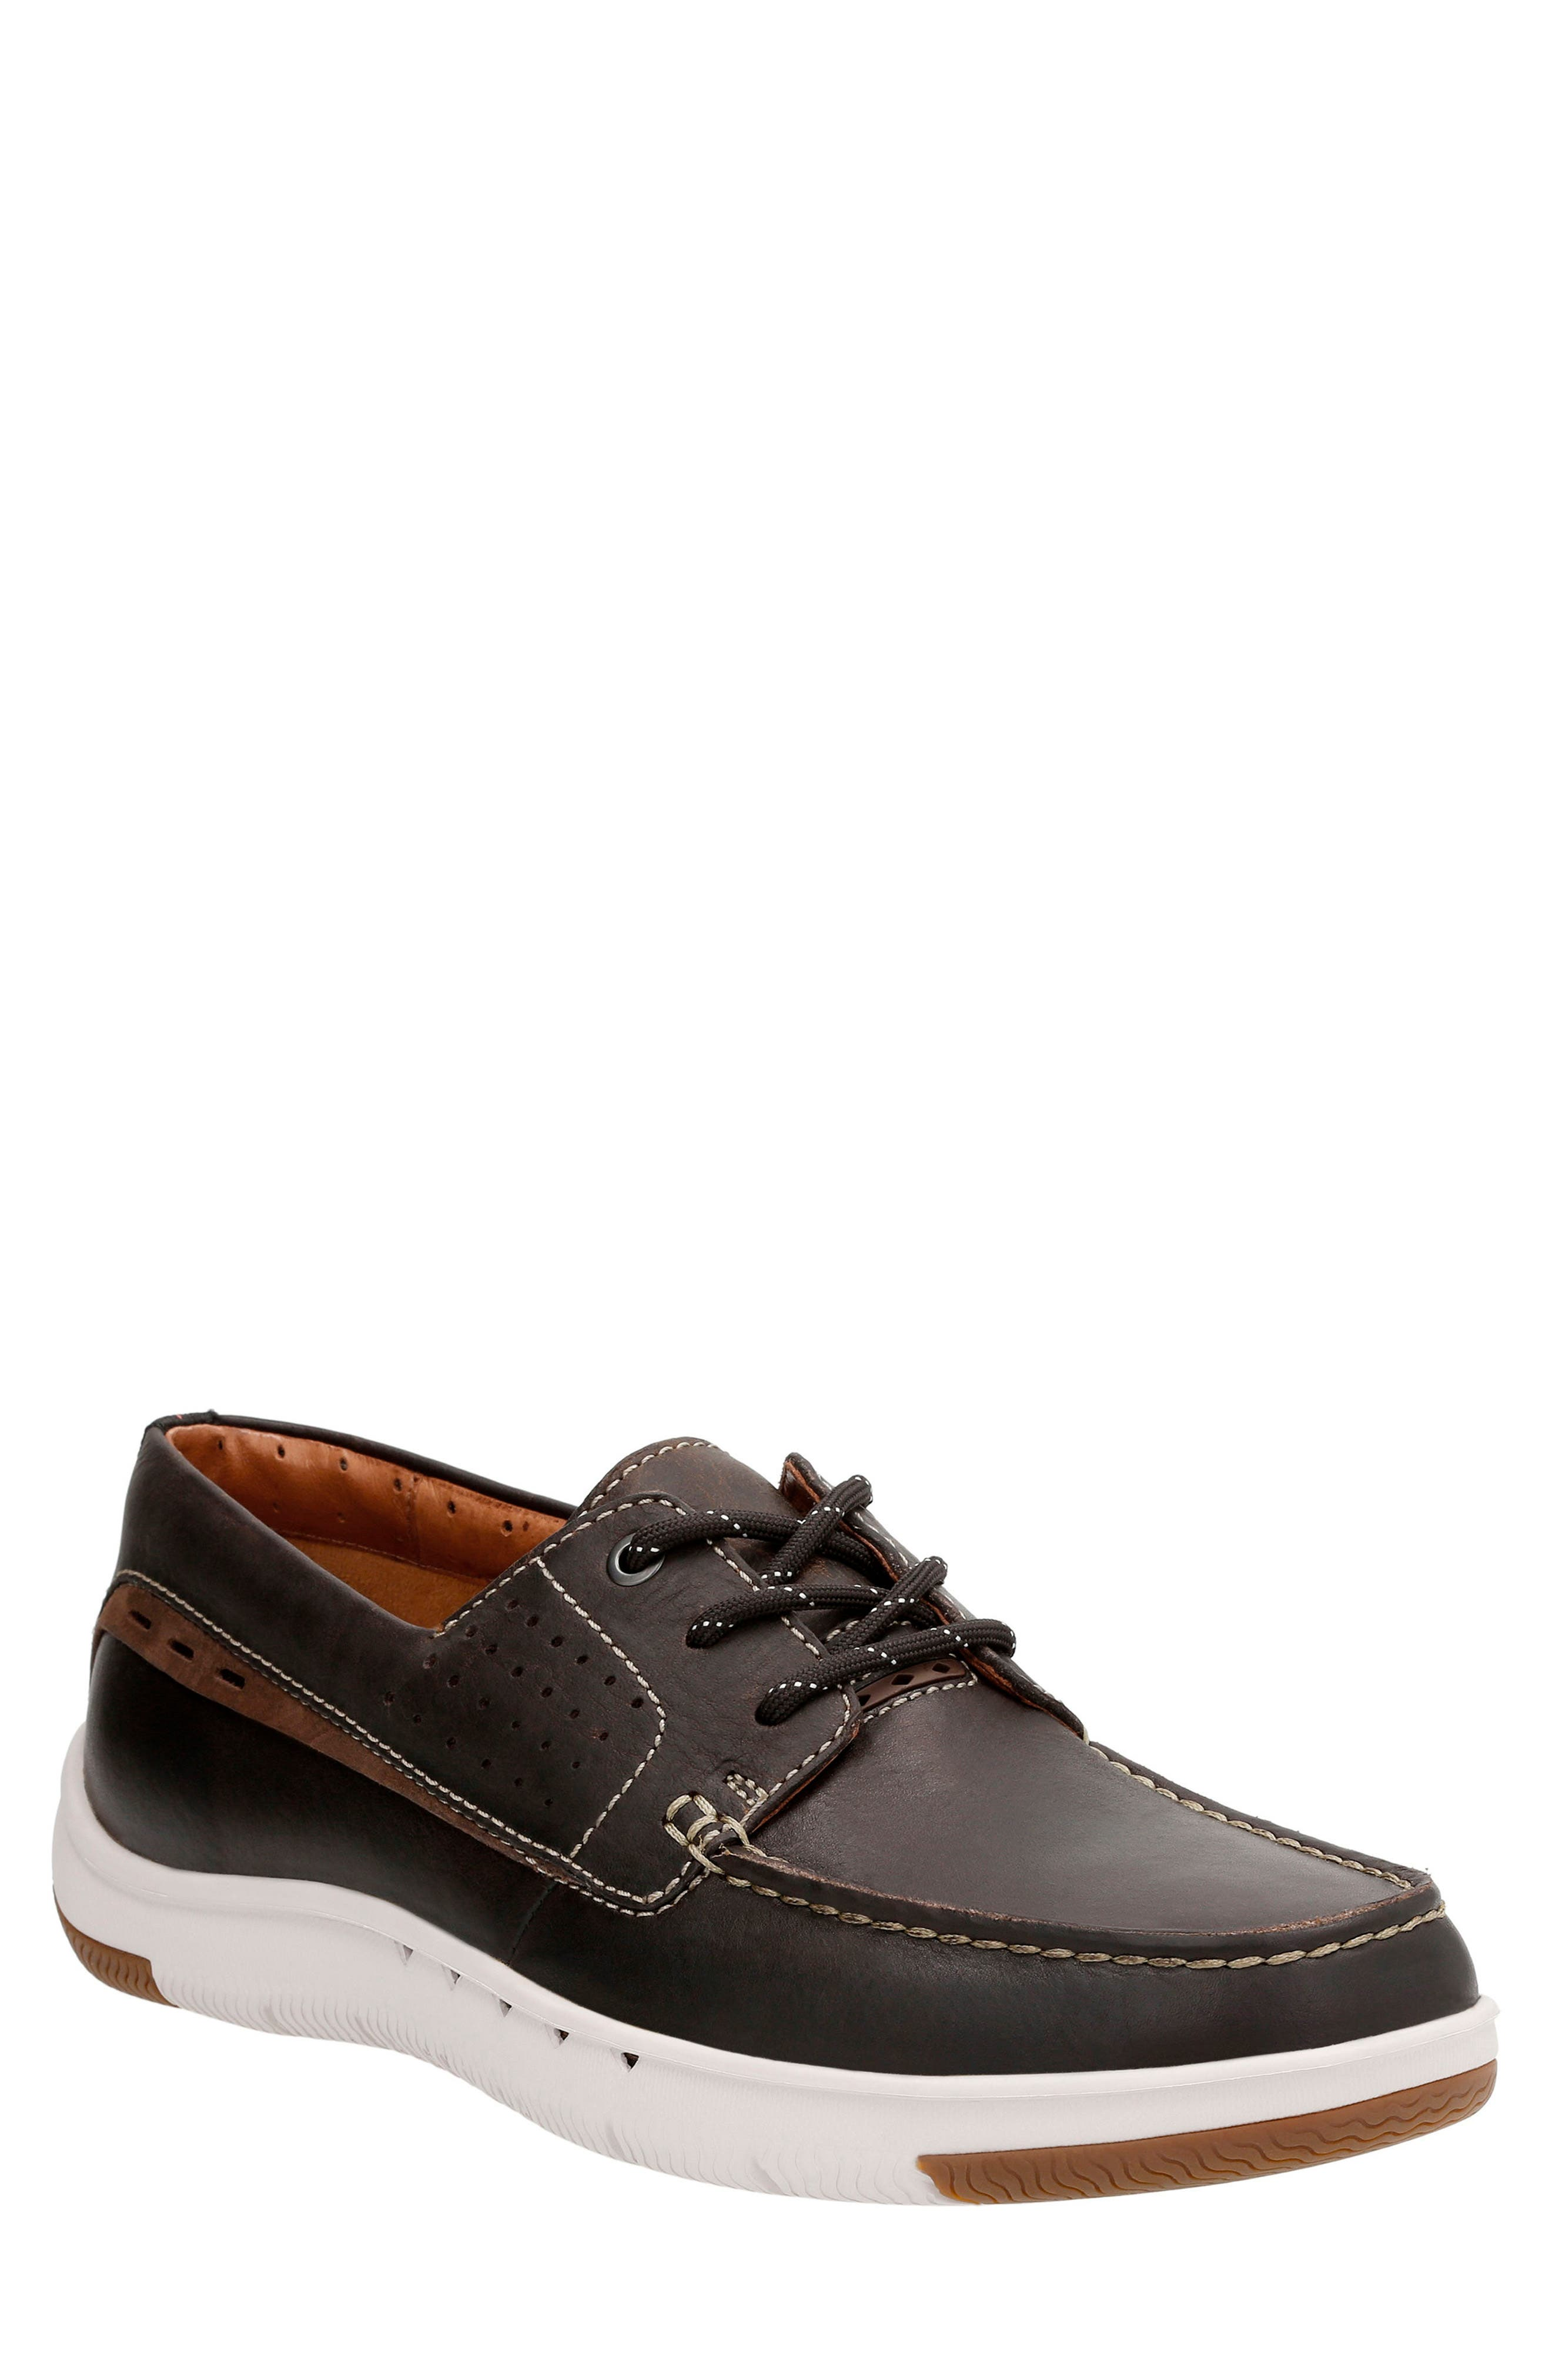 Clarks® Un.Maslow Sneaker (Men)